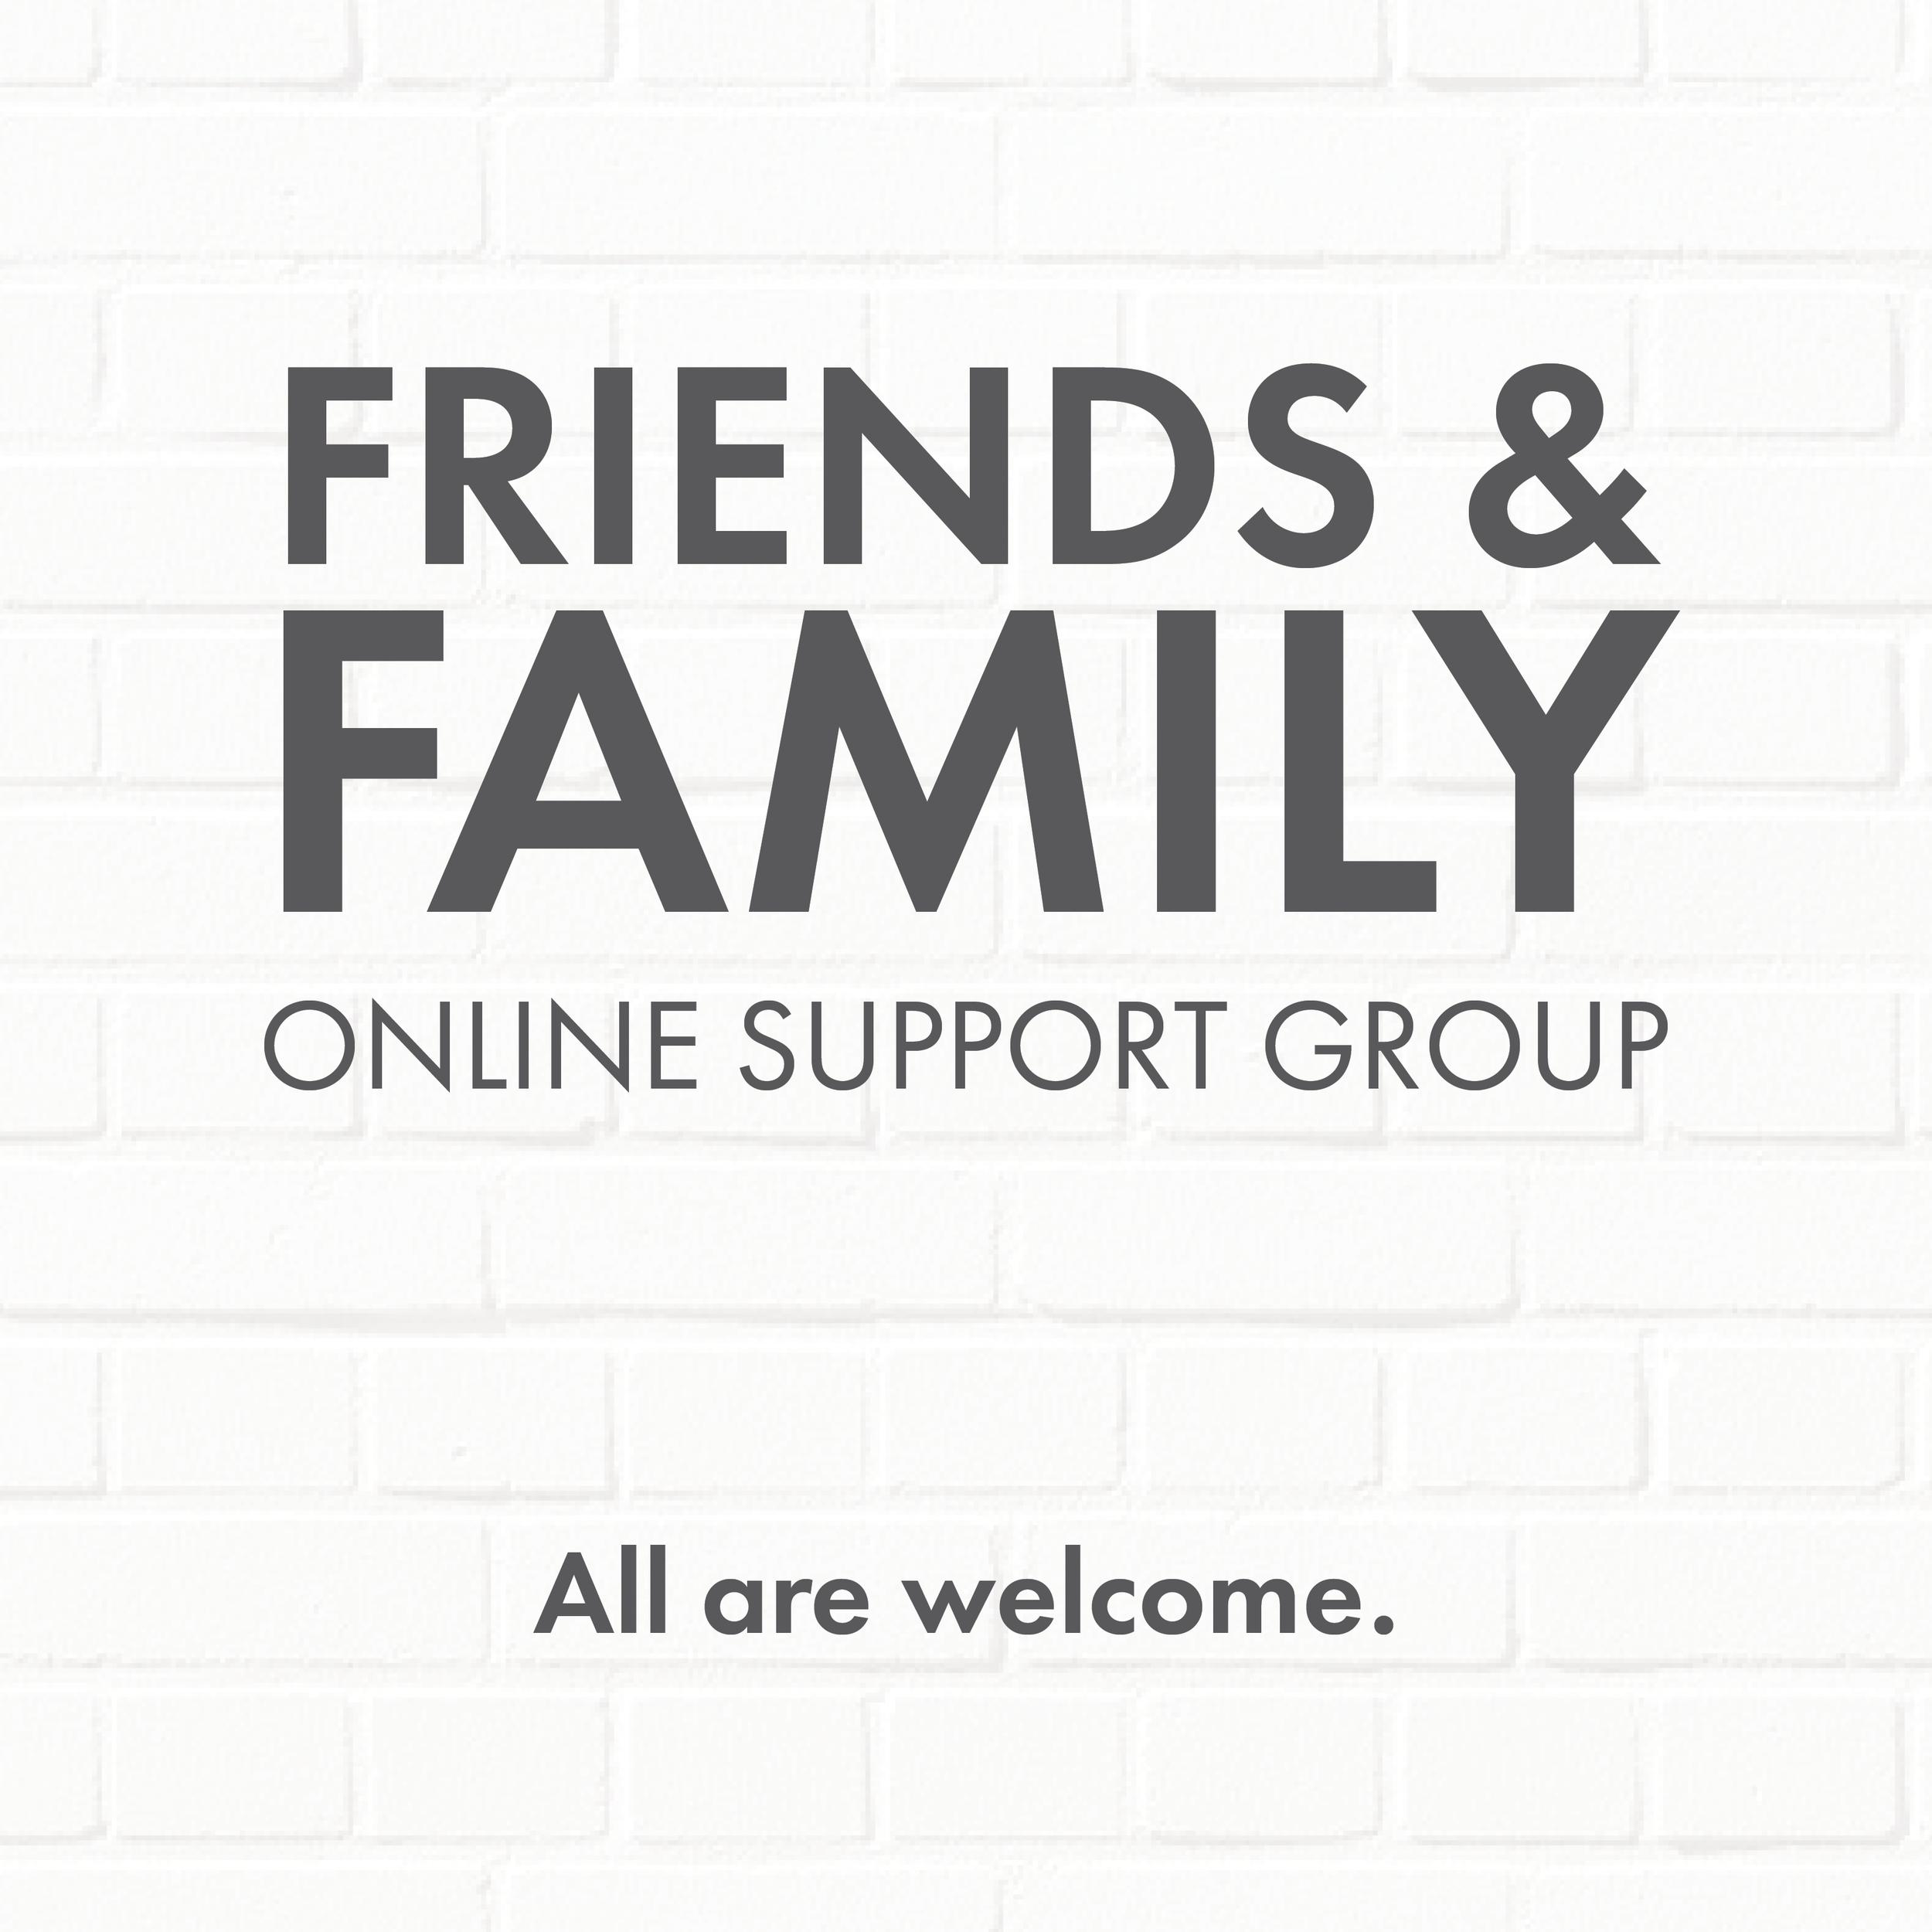 friendsandfamilysupportgroupgraphic_grey.png